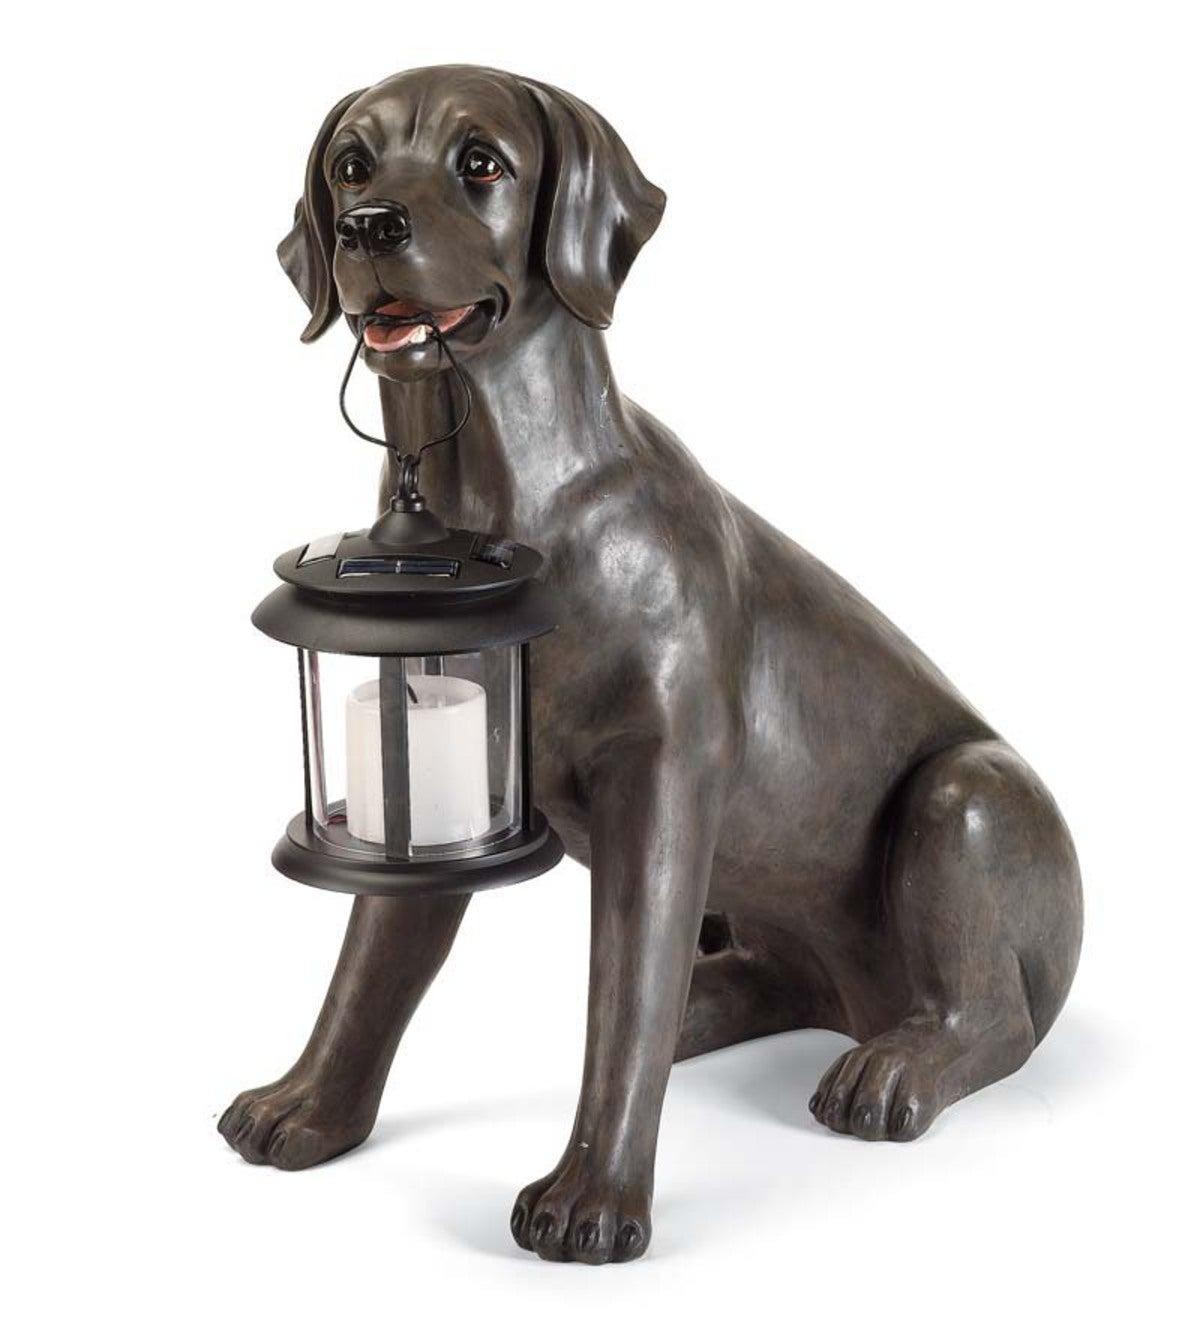 Black Labrador Dog Statue Holding A Solar Lantern